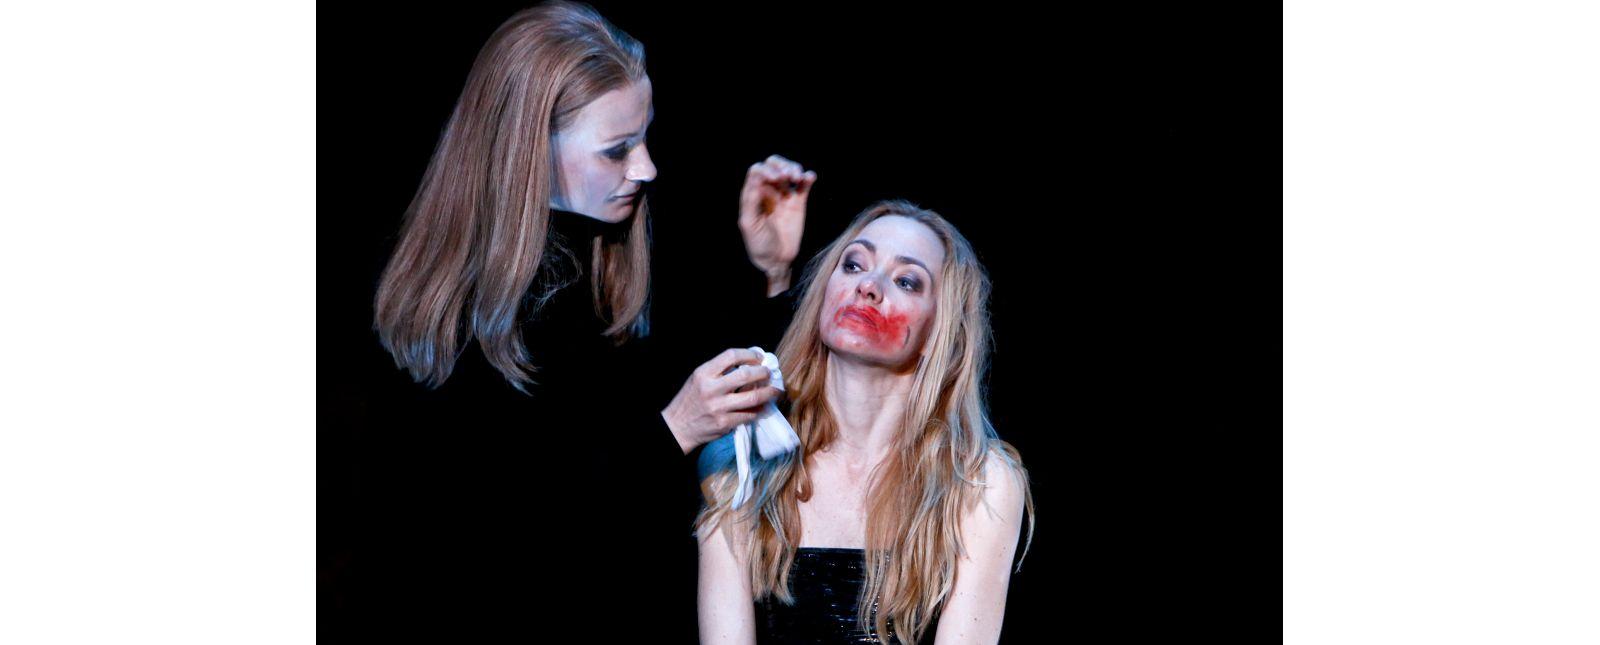 Der Widerspenstigen Zähmung // Alona Szostak / Aleksandra Cwen // 2020 // Birgit Hupfeld